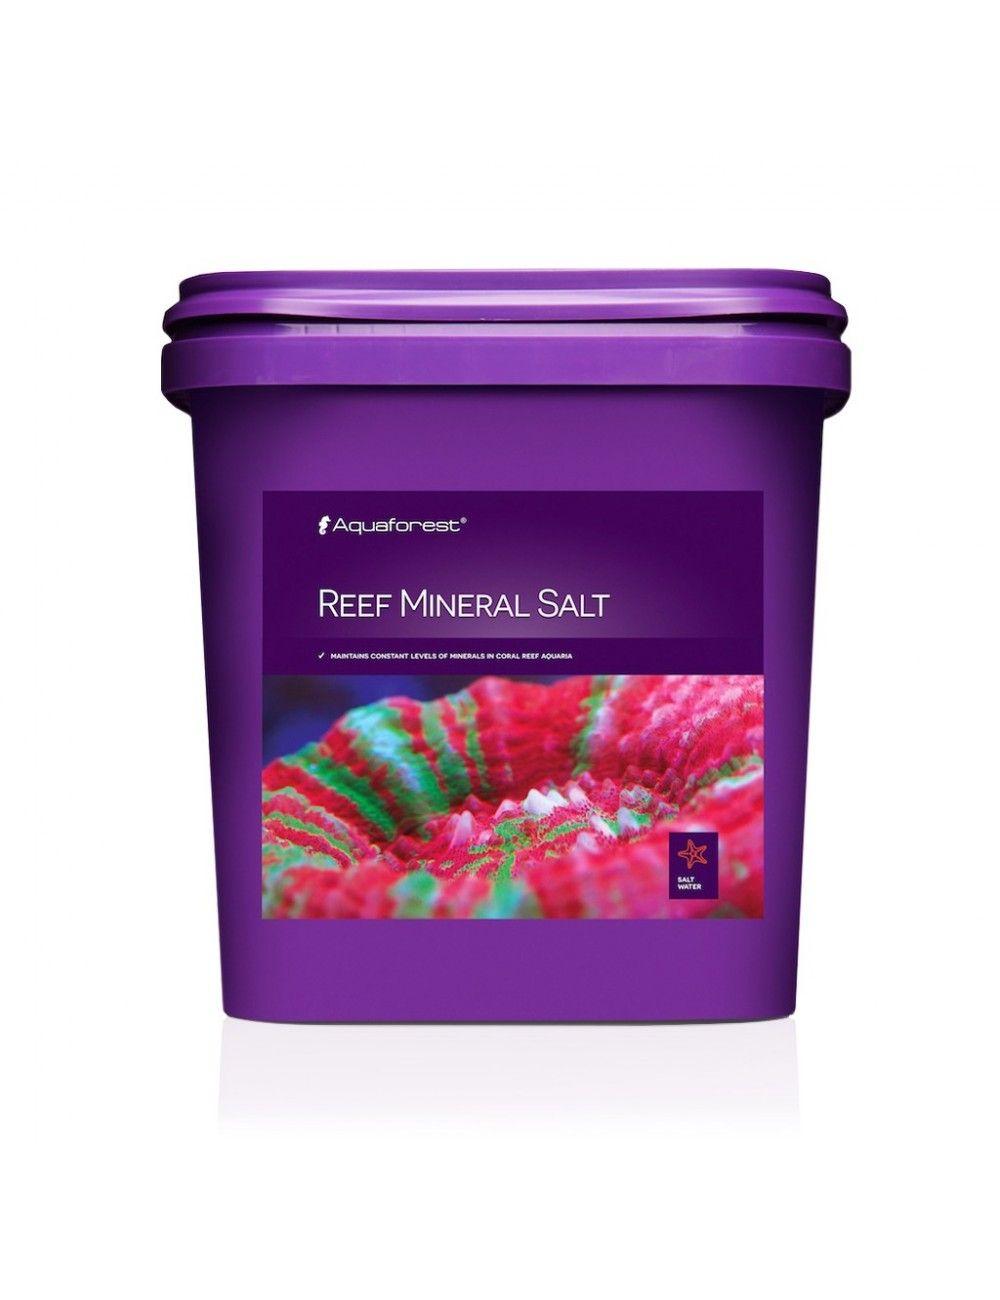 AQUAFOREST Reef mineral salt 5000g